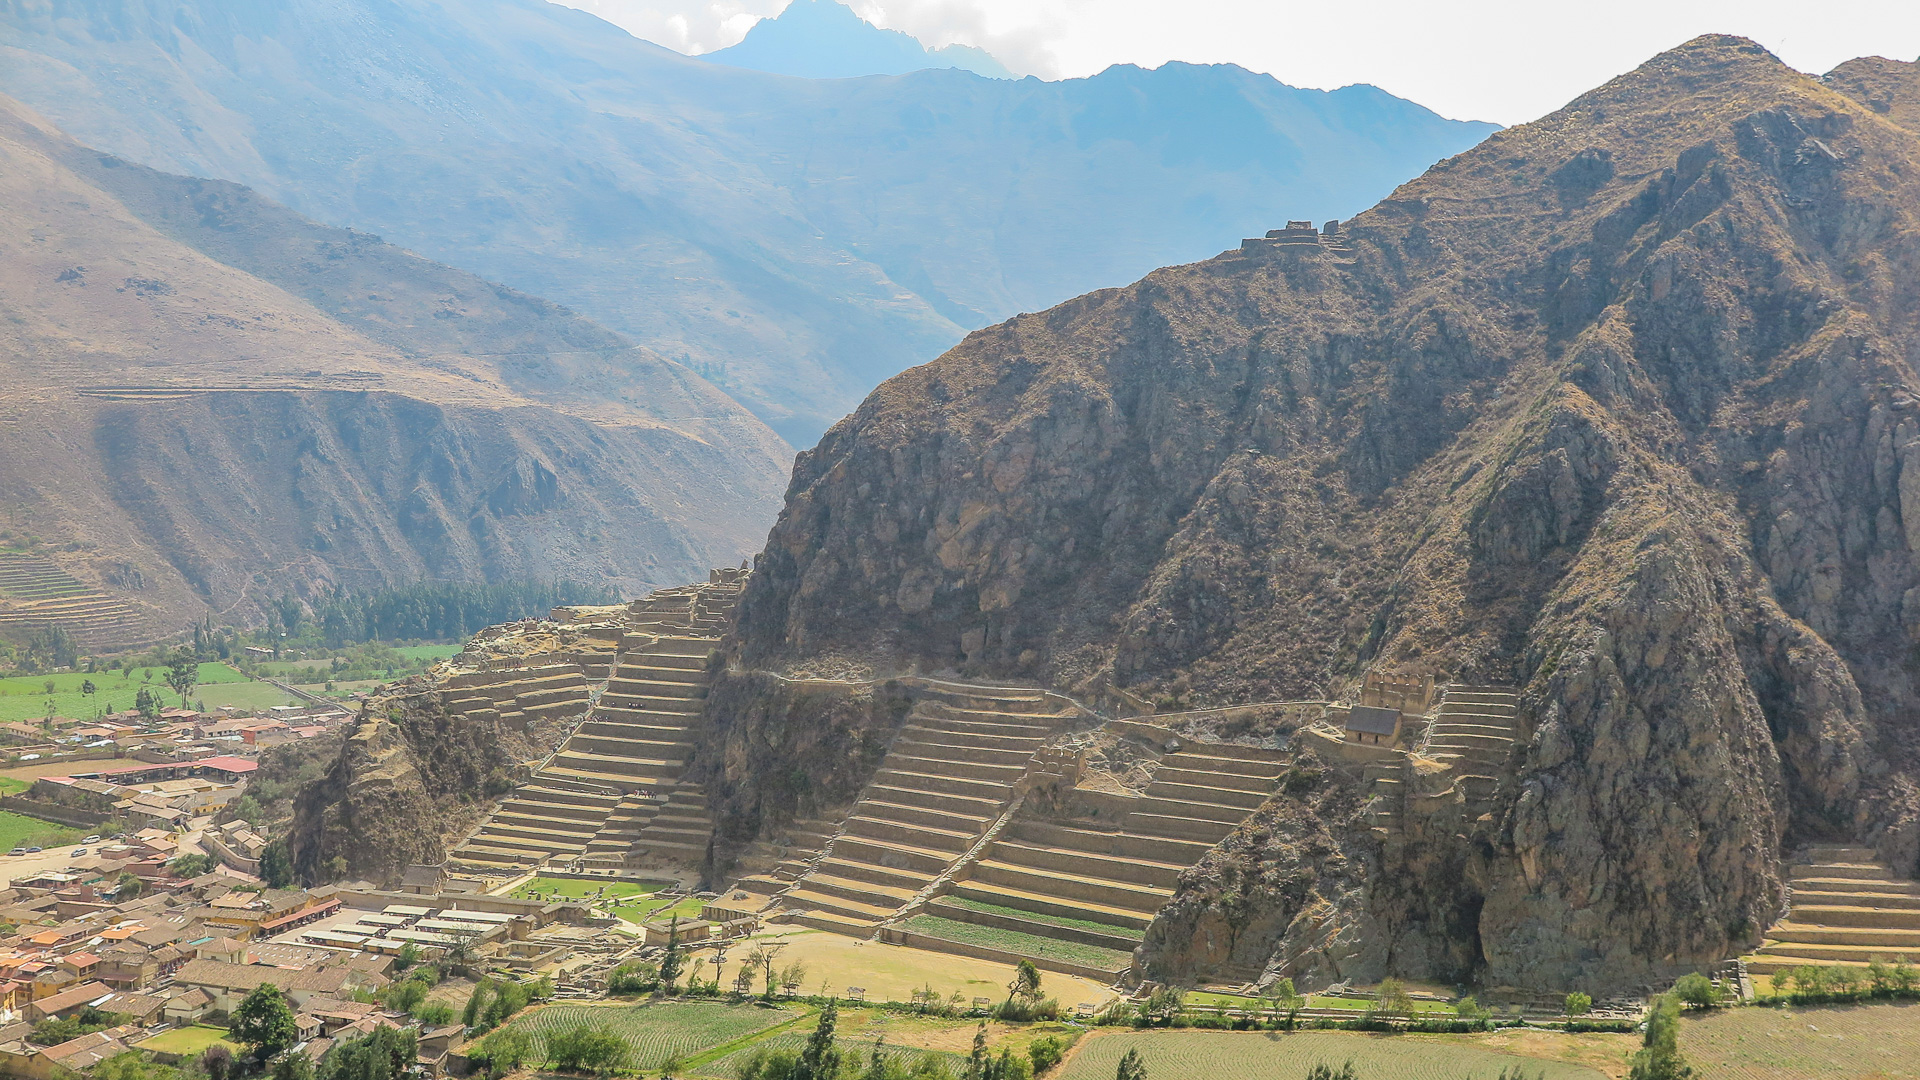 Sítio Arqueológico de Ollantaytambo (Viajar, Ver e Viver)